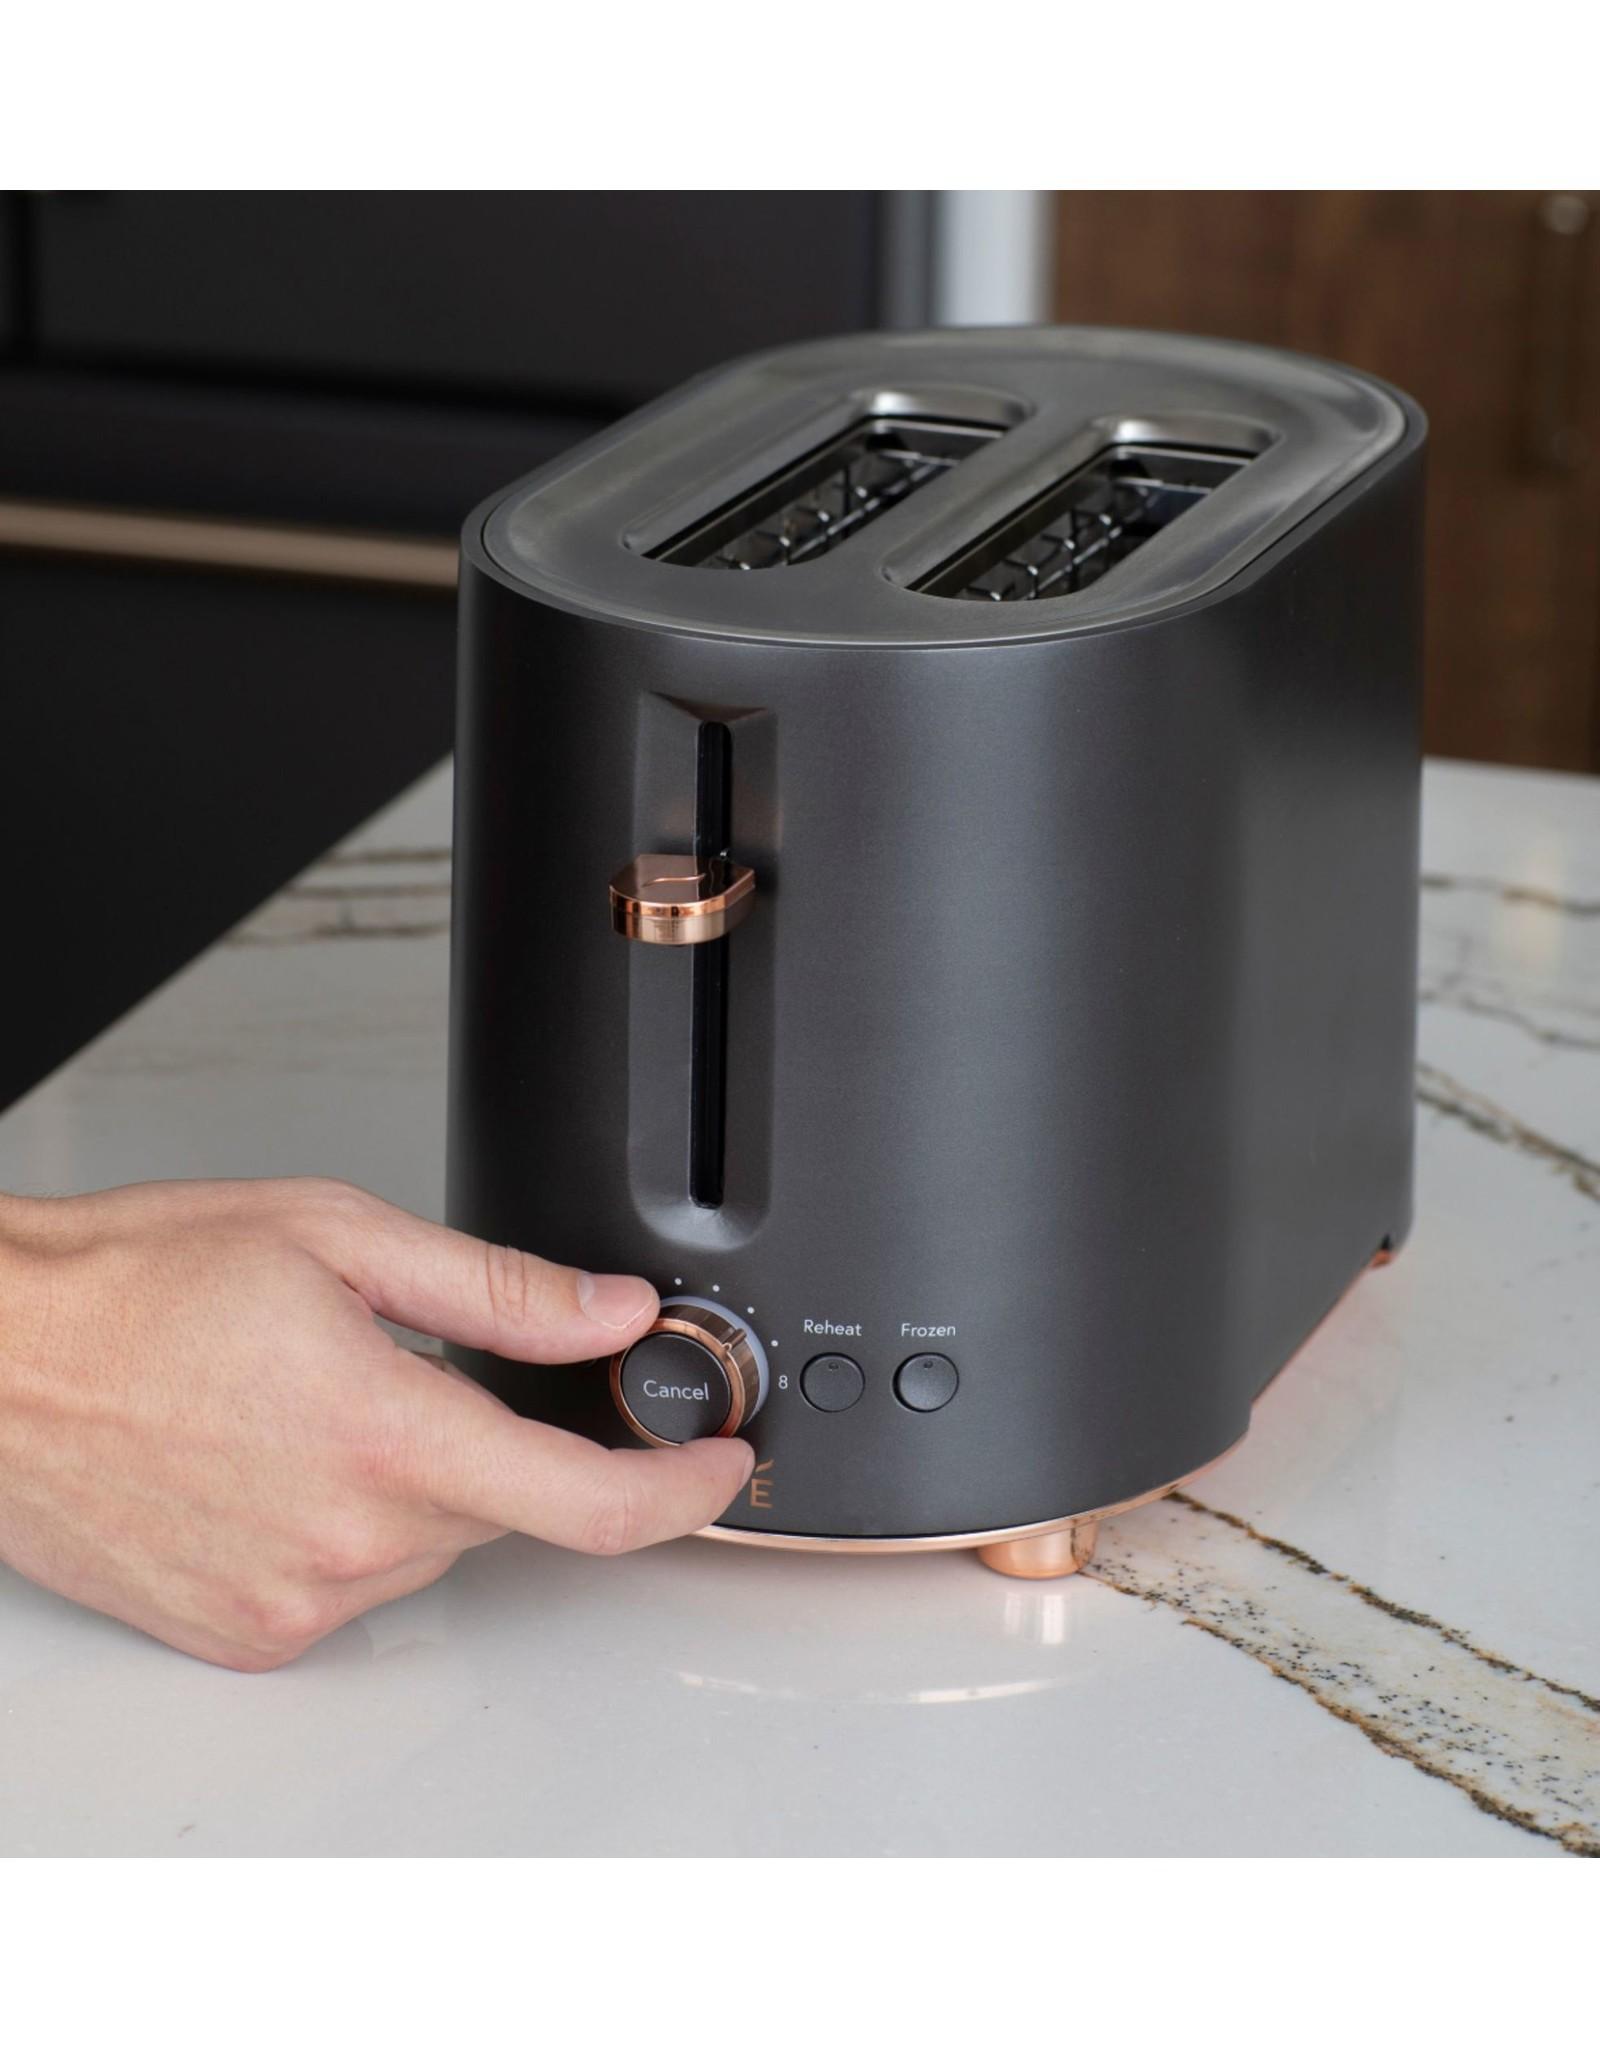 Cafe' C9TMA2S3PD3 Café - Specialty 2-Slice Toaster - Matte Black